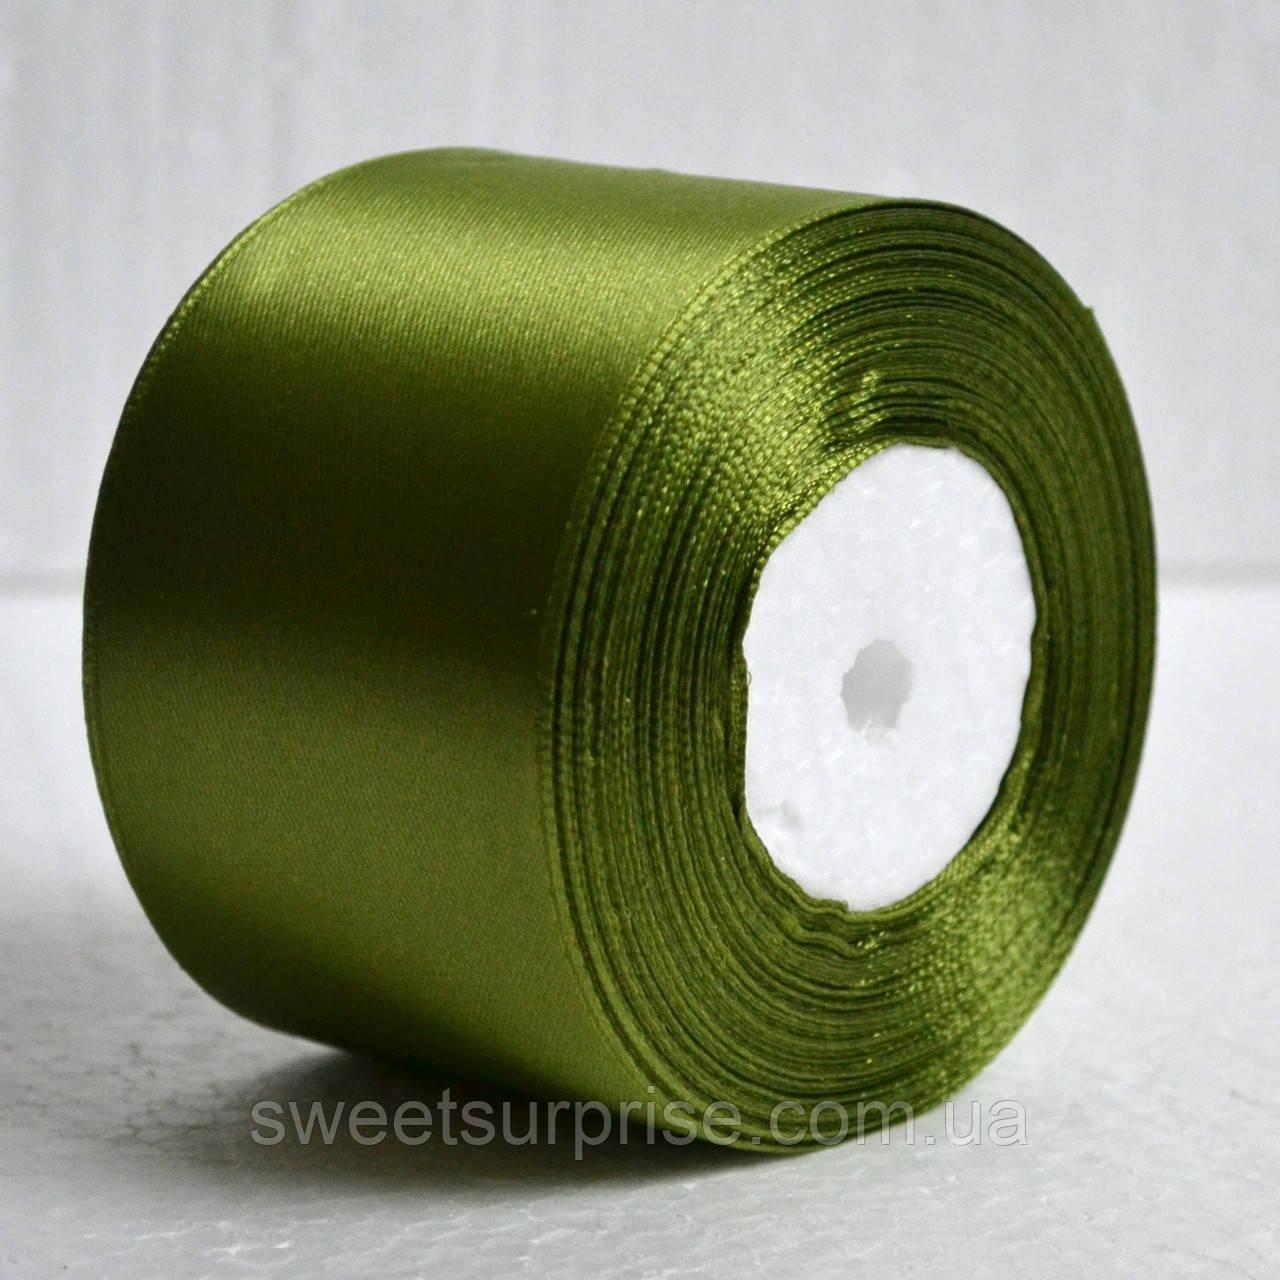 Лента атласная 48 мм (золотая оливка)